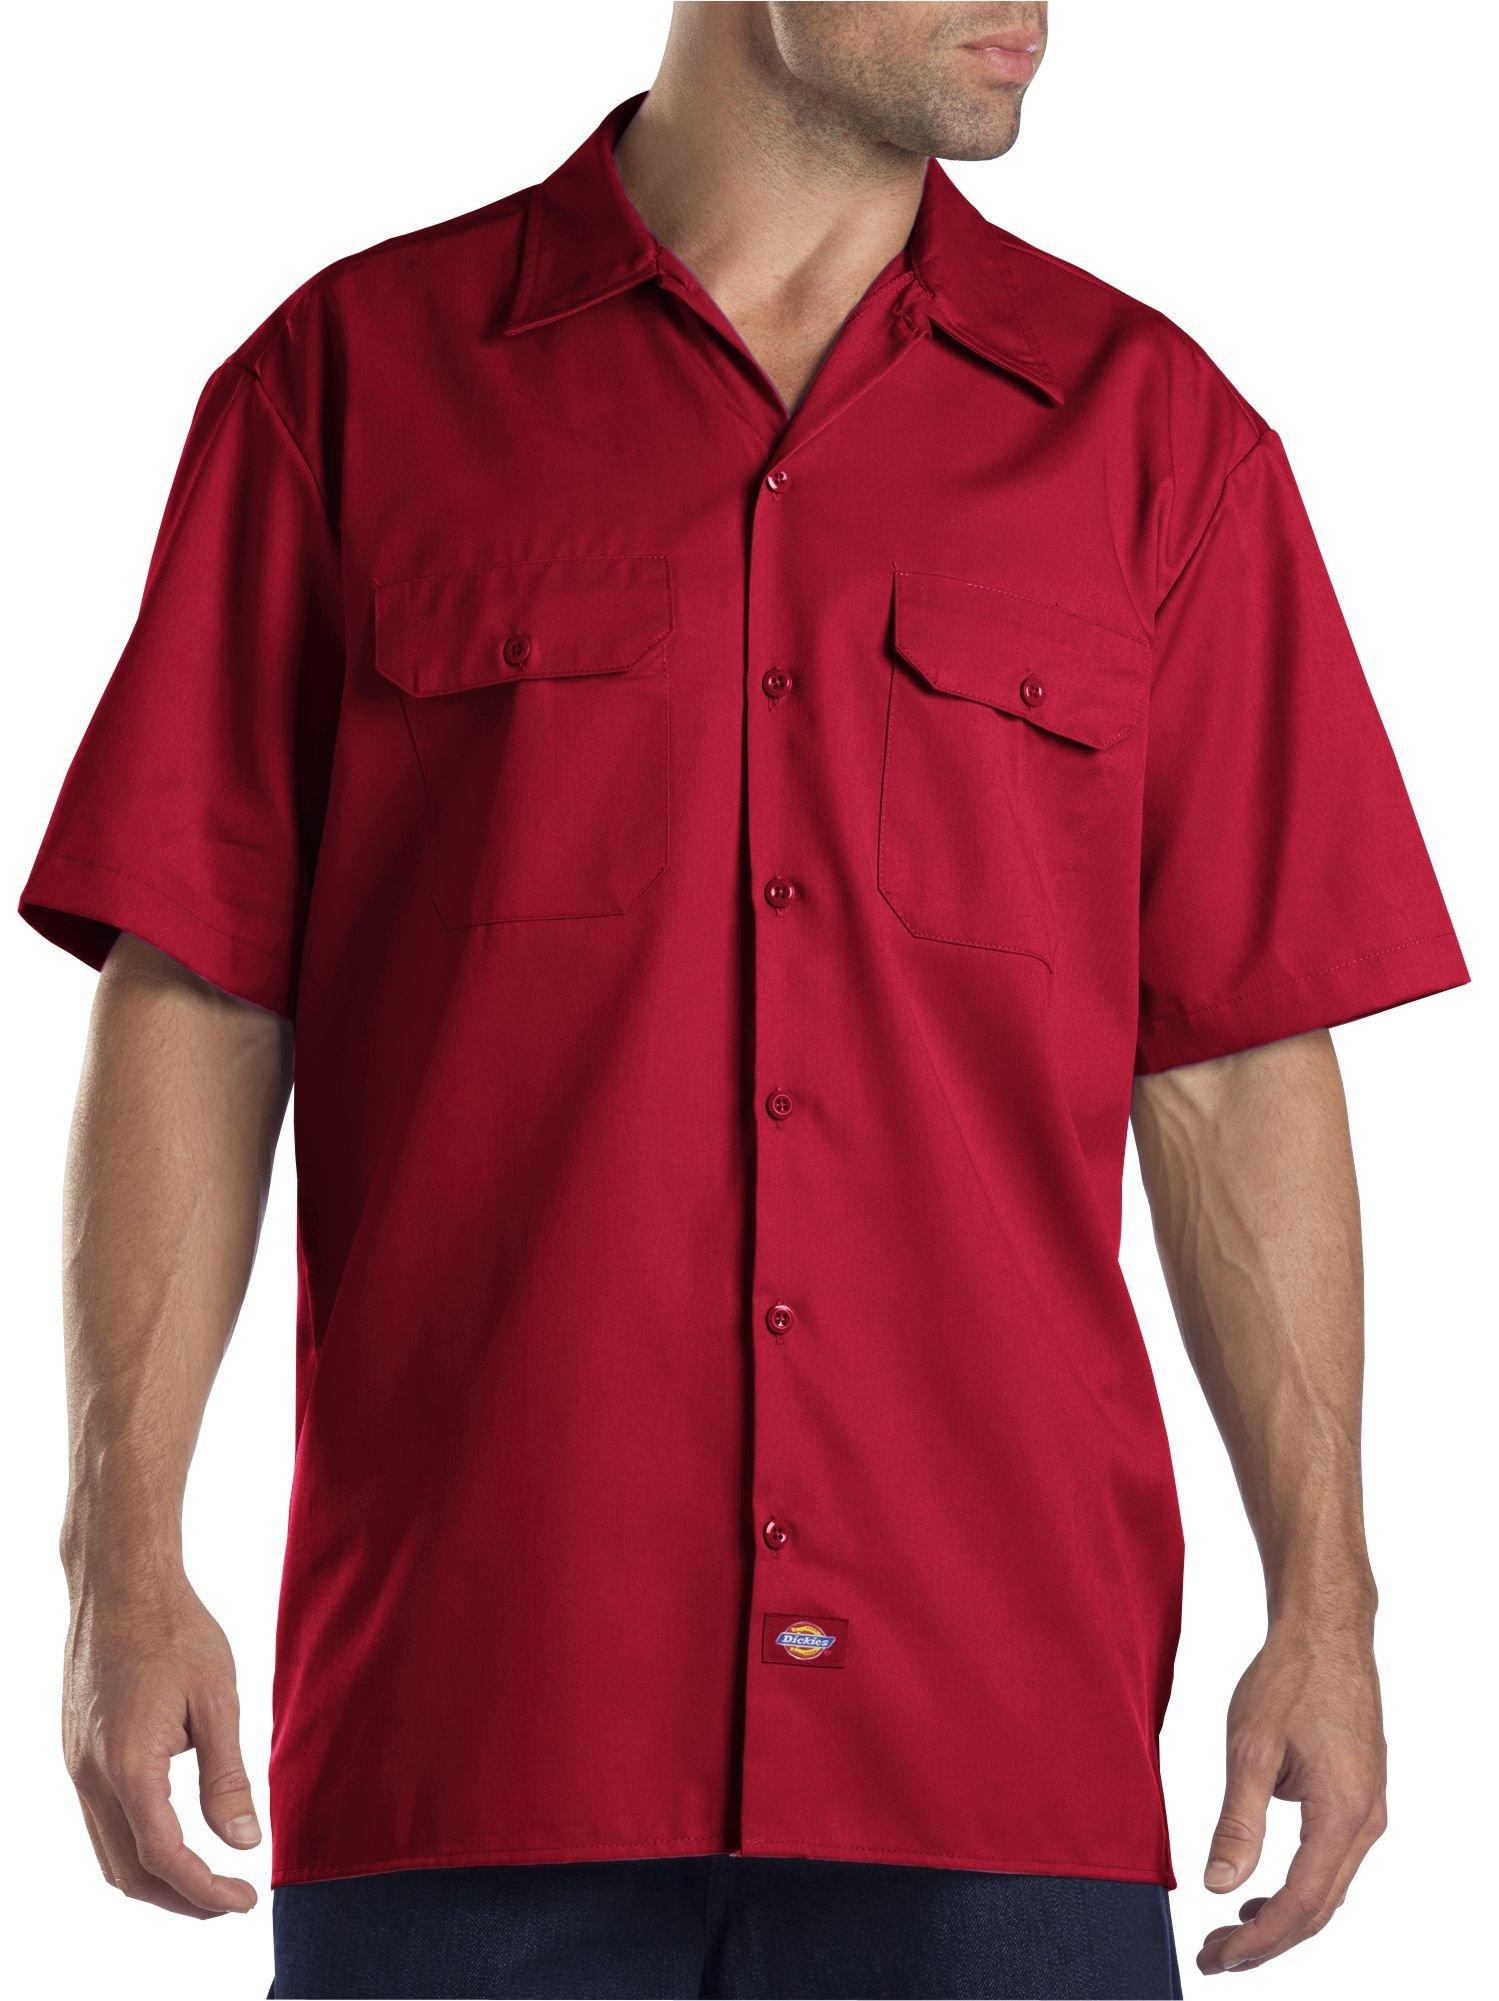 Dickies Men's Short-Sleeve Work Shirt, English Red, 2X-Large